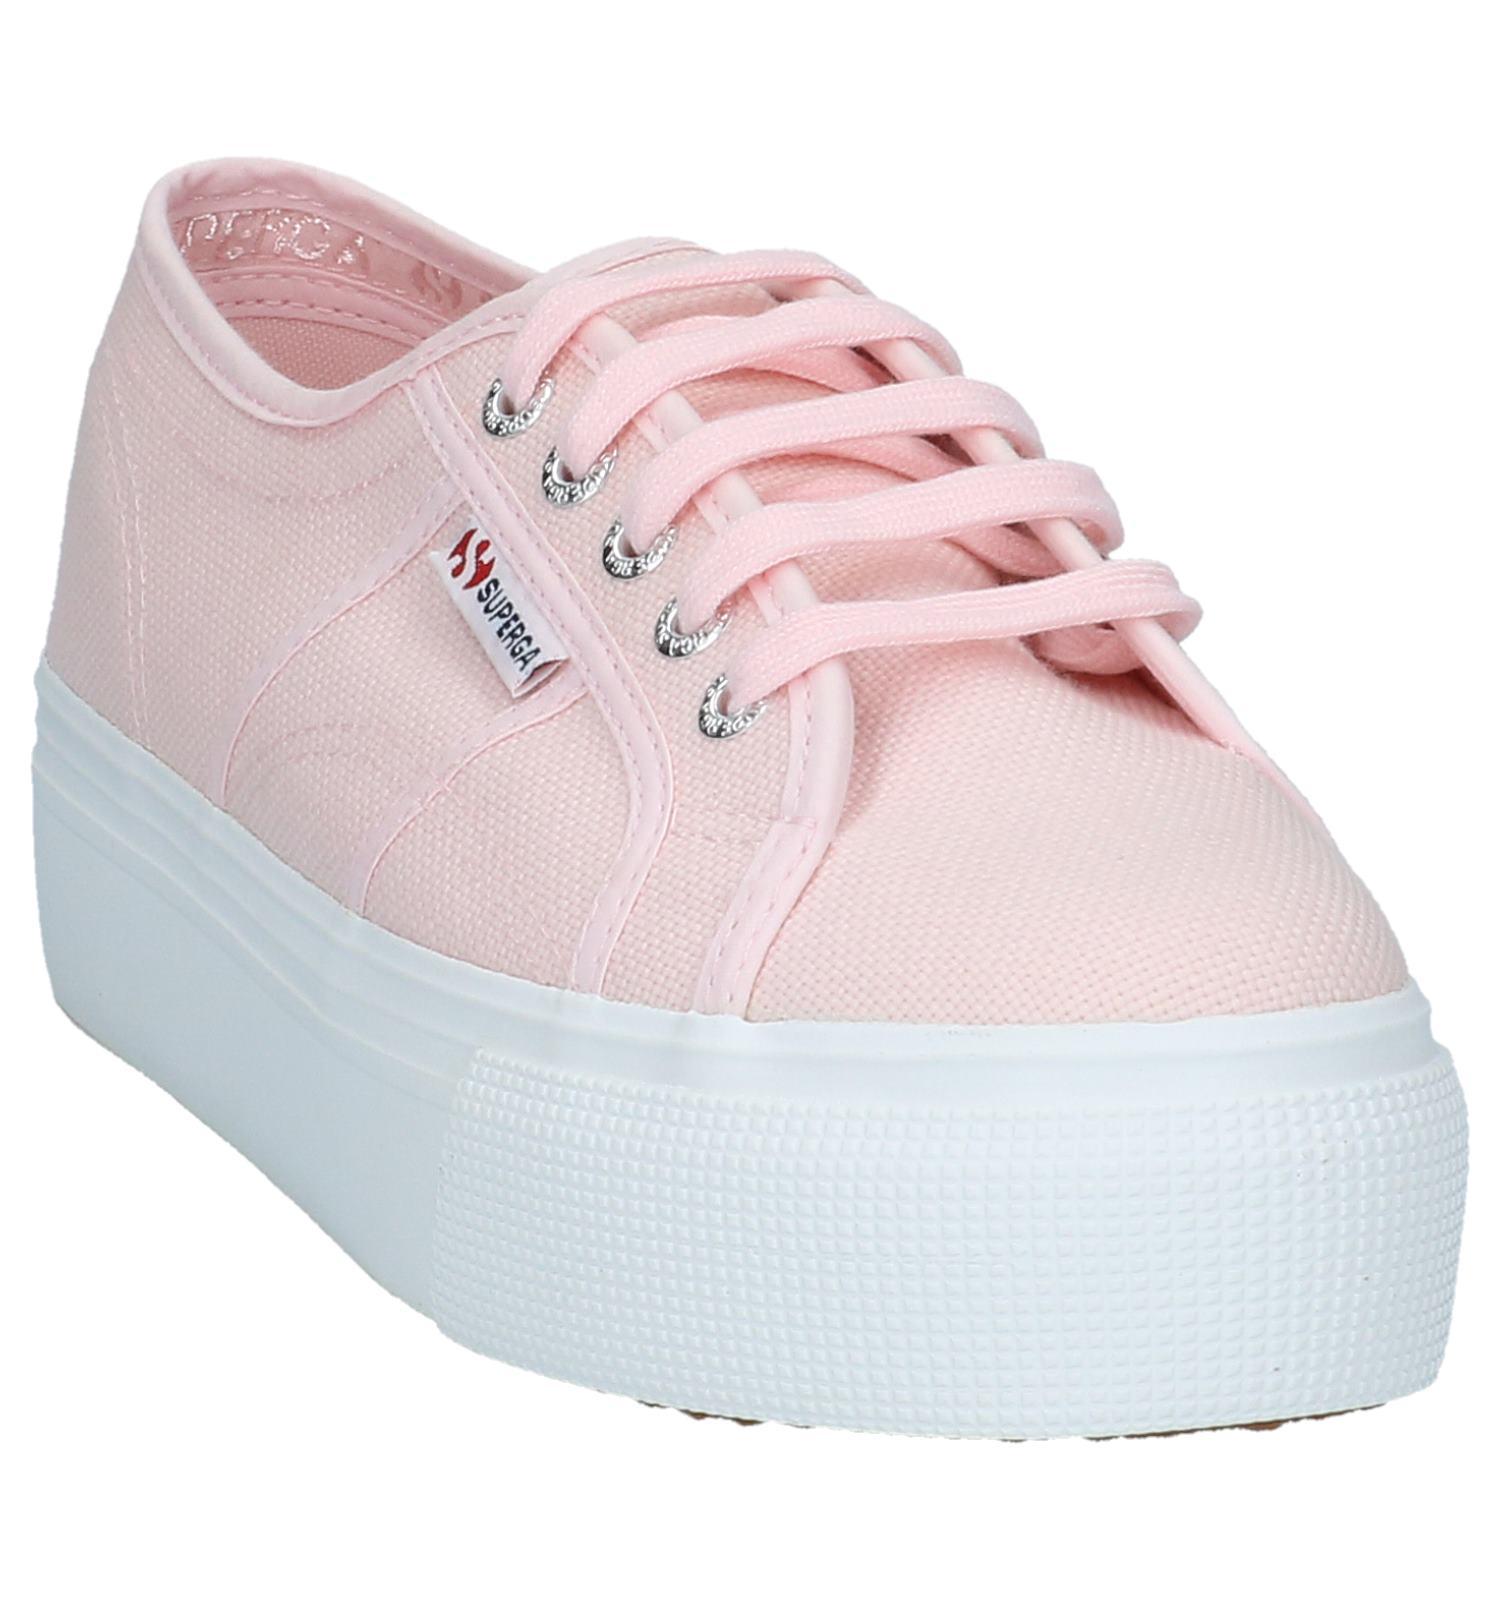 Licht Superga Sneakers Met Plateauzool Roze uTPXZOki